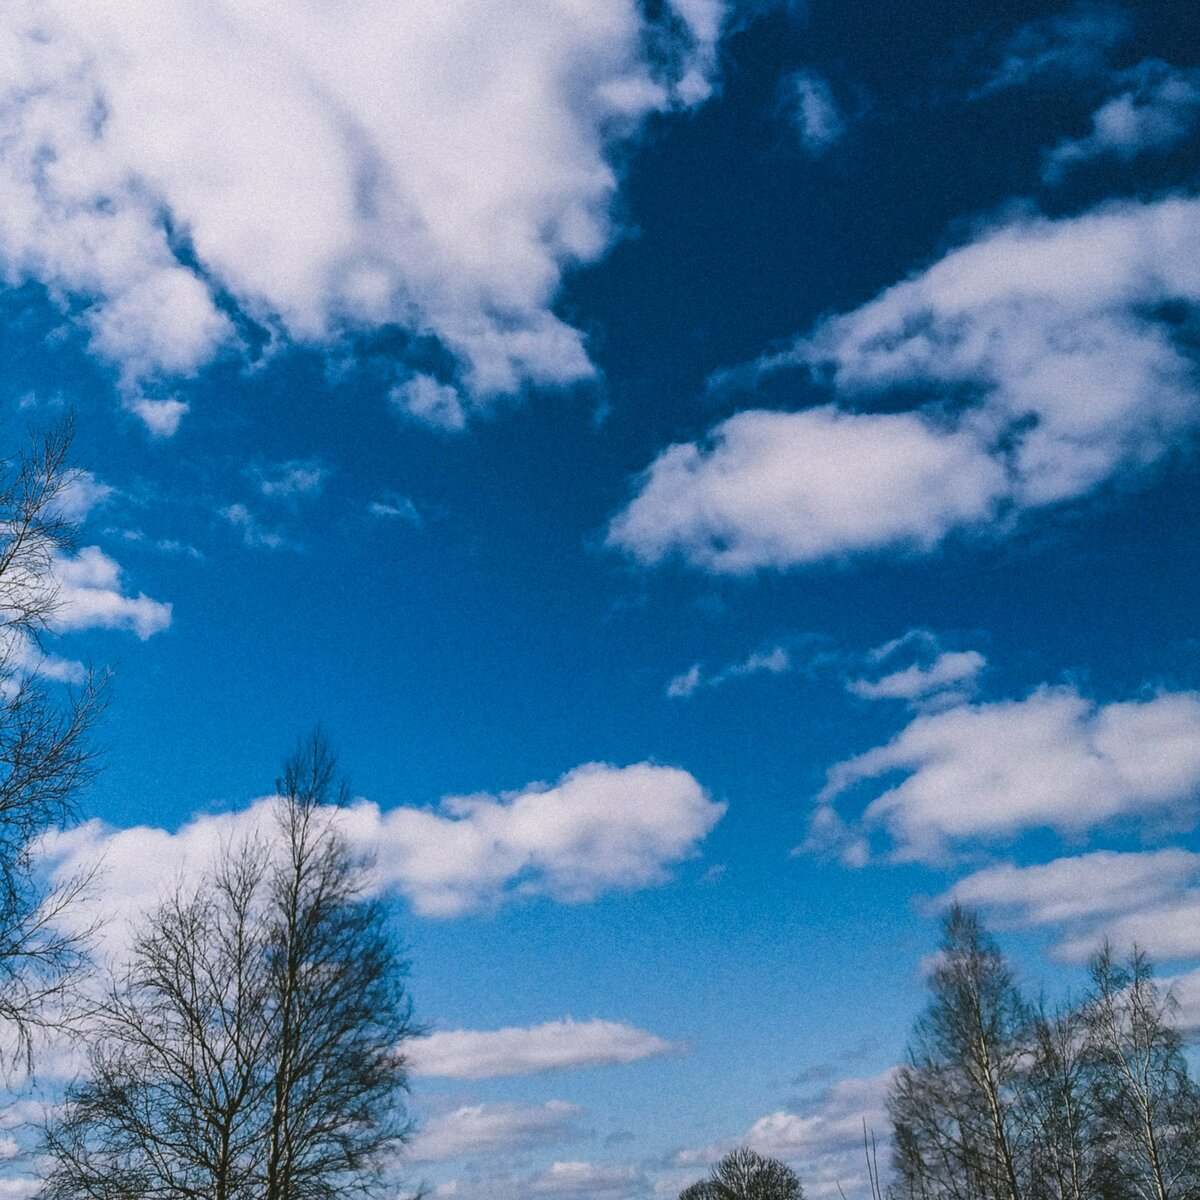 Картинки неба весеннего